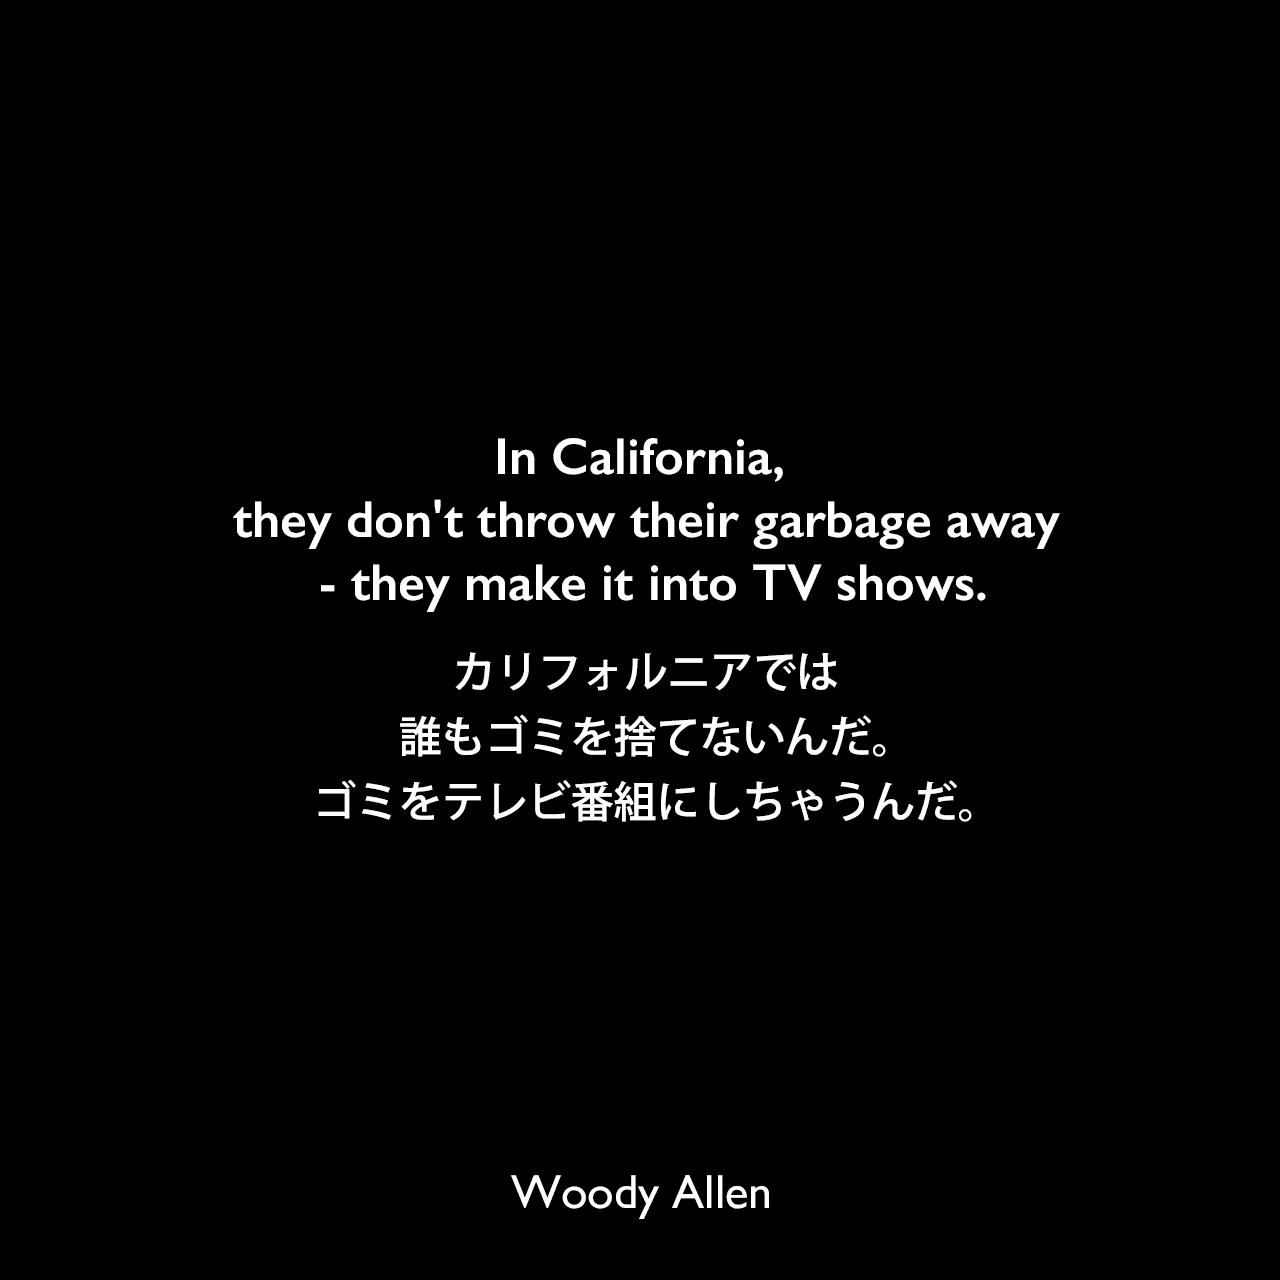 In California, they don't throw their garbage away - they make it into TV shows.カリフォルニアでは、誰もゴミを捨てないんだ。ゴミをテレビ番組にしちゃうんだ。Woody Allen